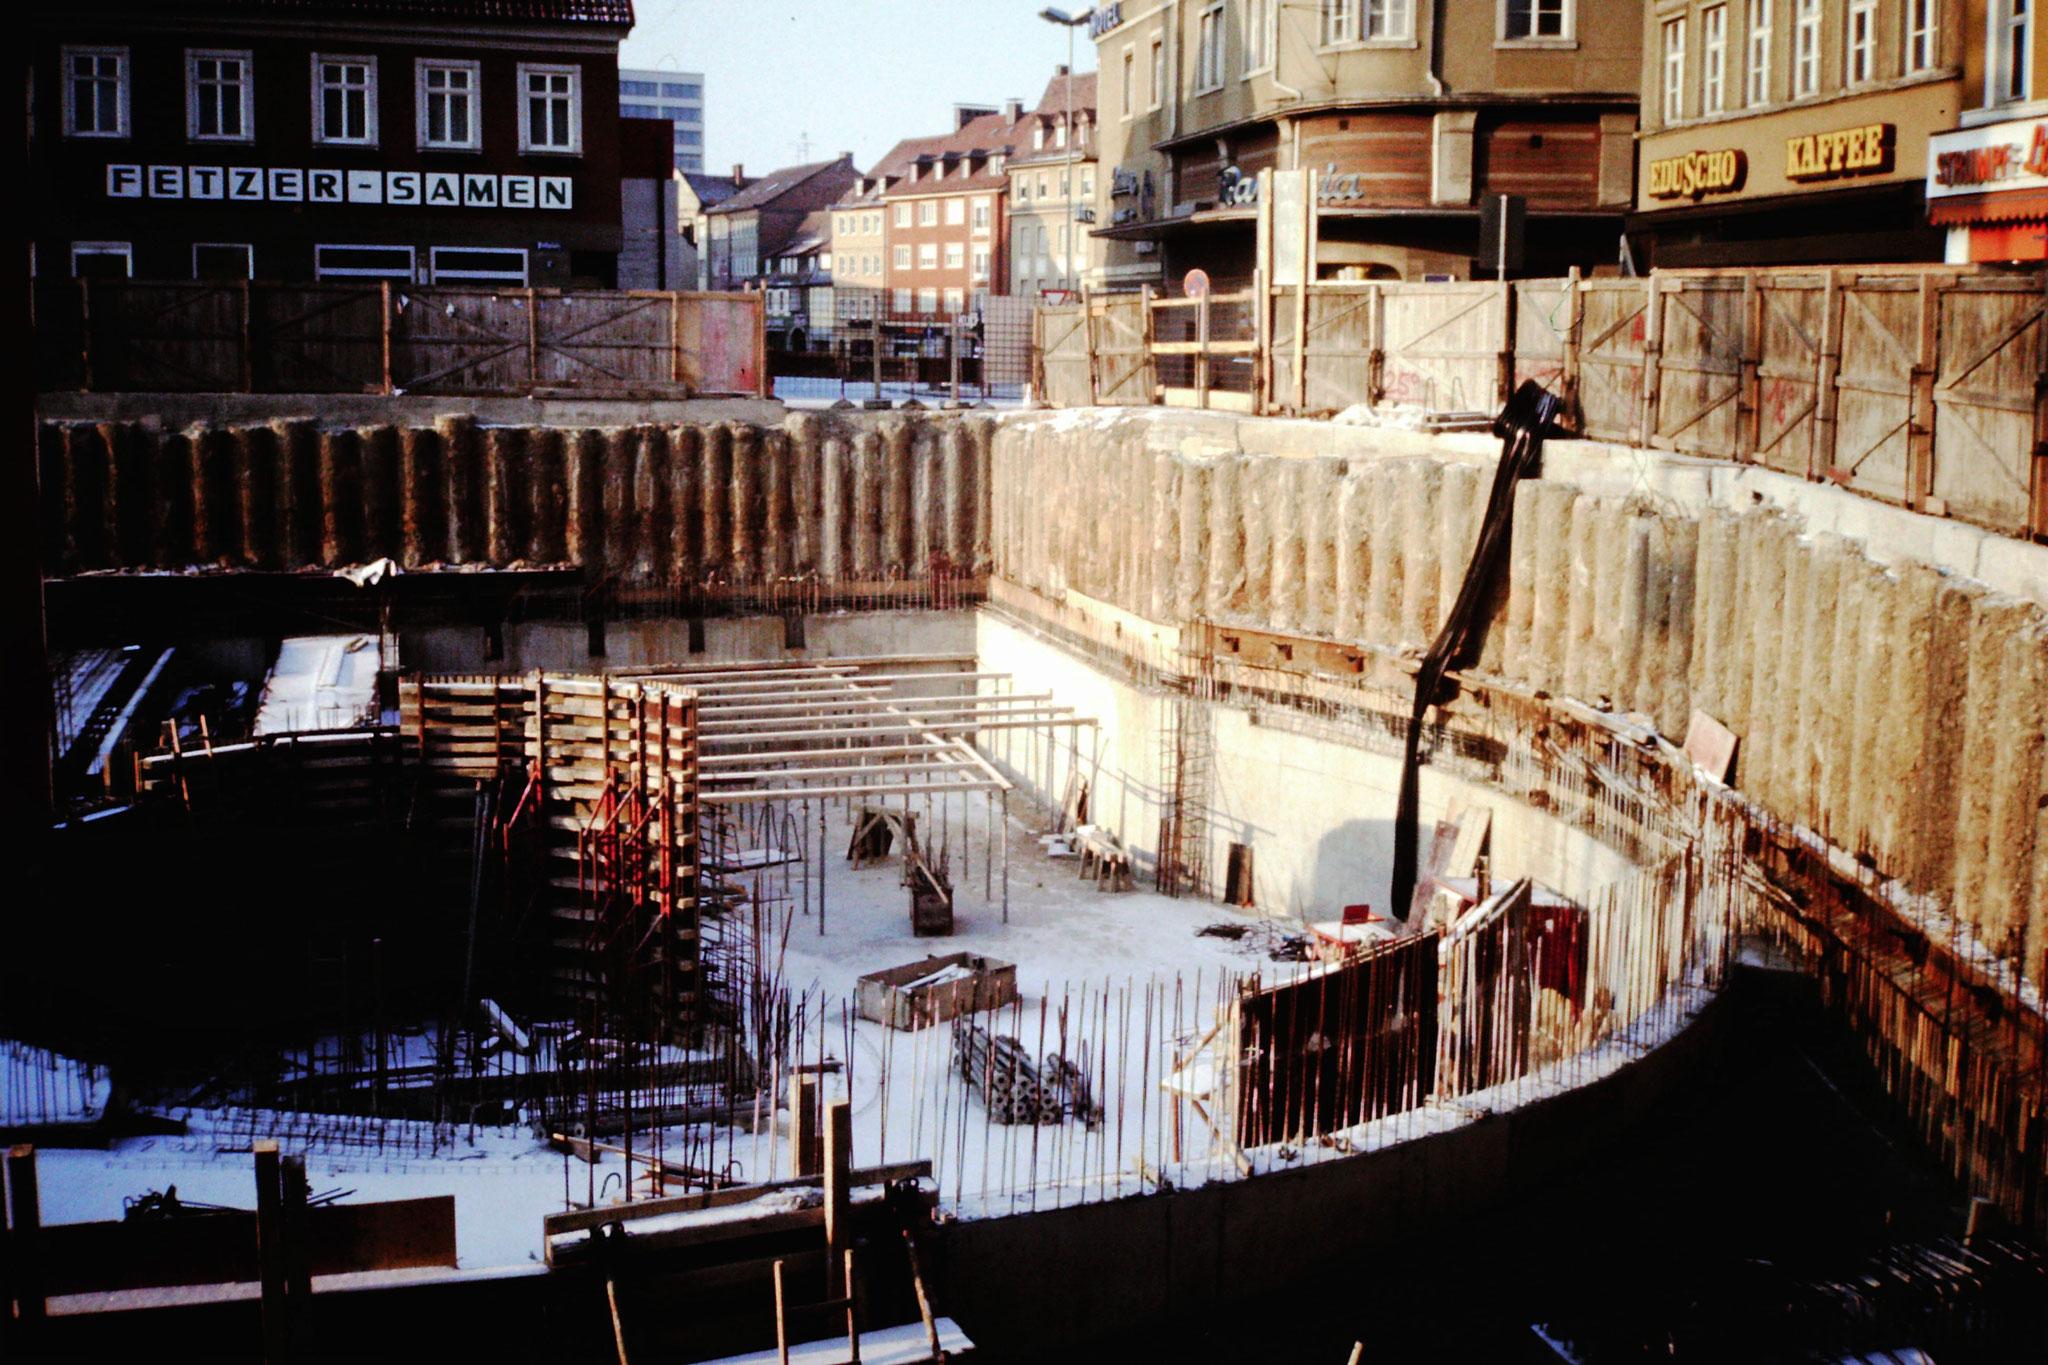 1987 - Tiefgaragenbau